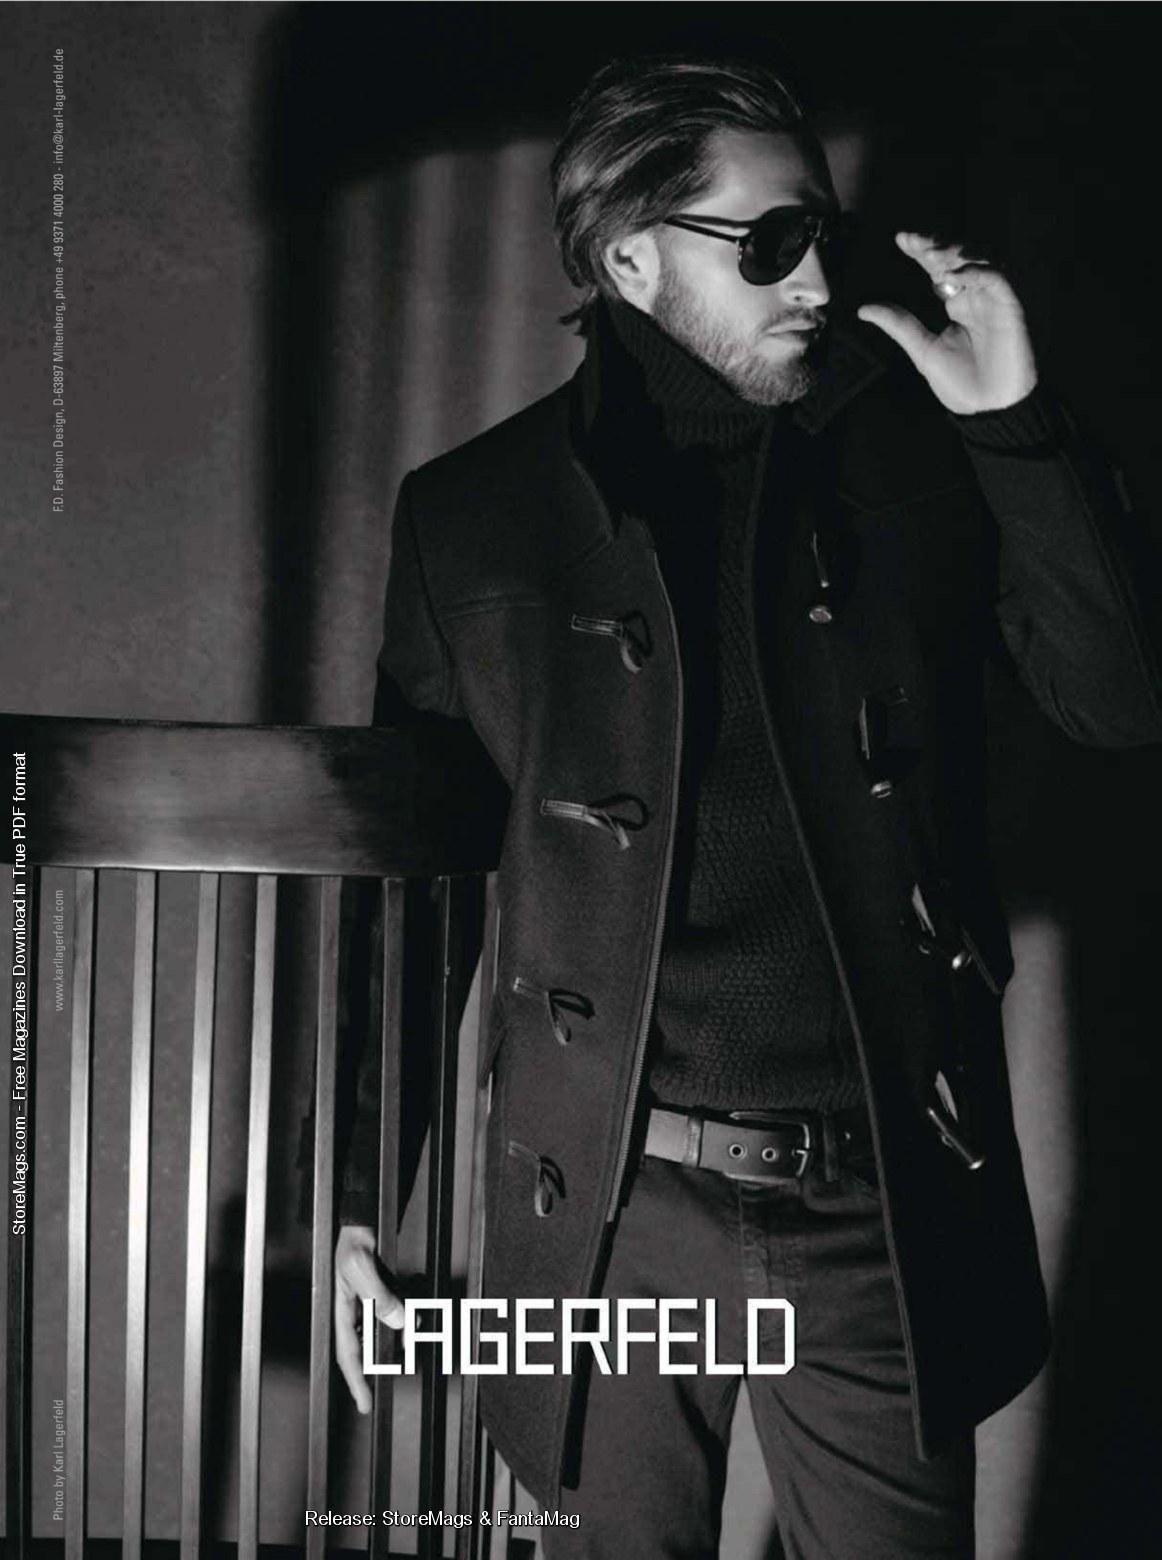 Lagerfeld Art8amby S Blog